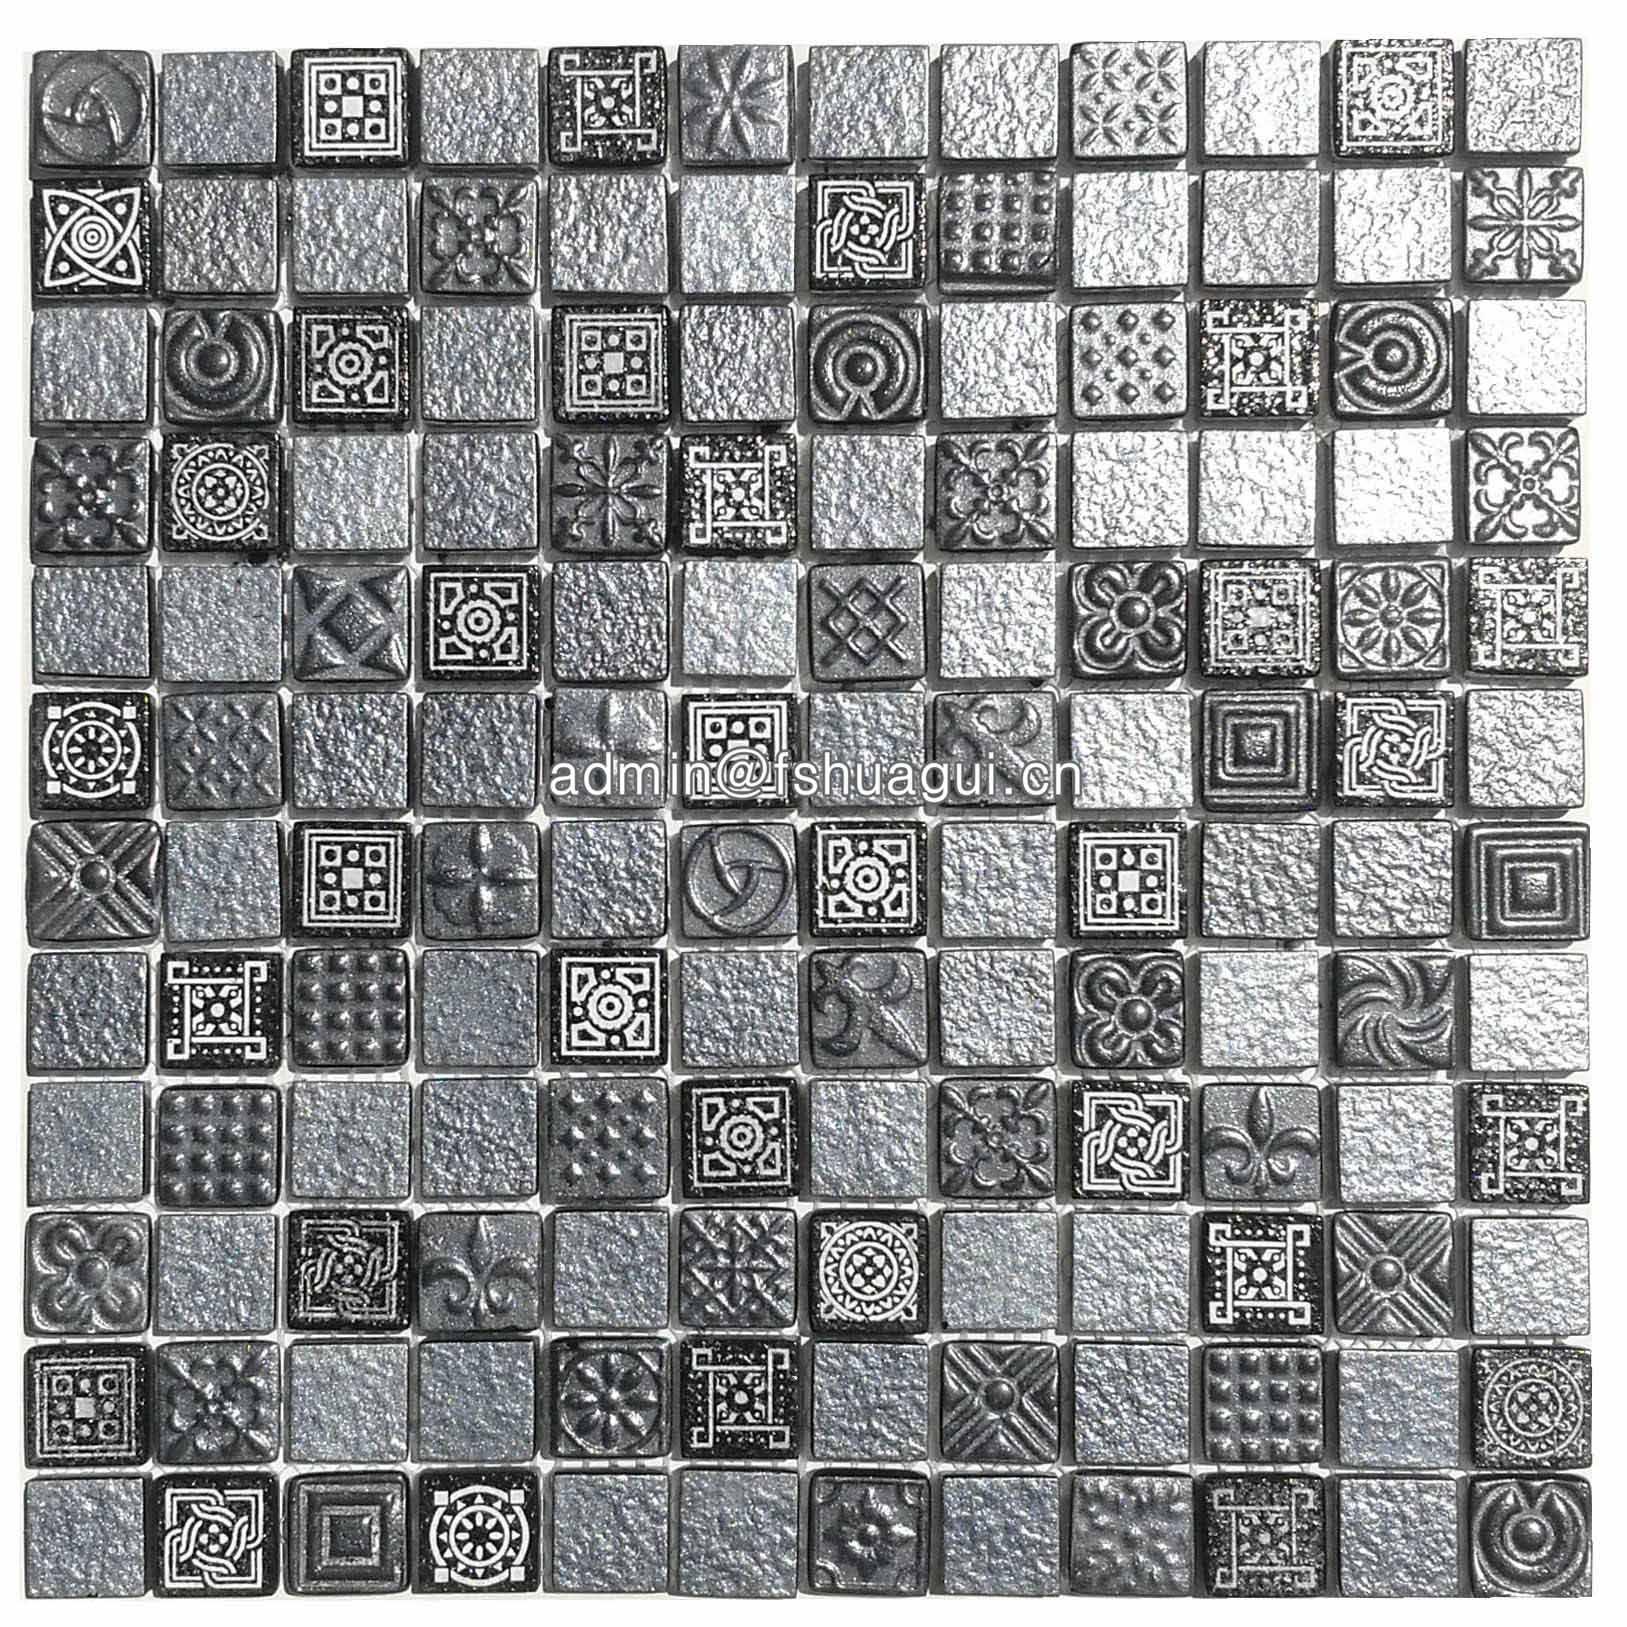 Huagui 1 inch black glass mosaic tiles backsplash HG-WJ418 GLASS MOSAIC TILE image21